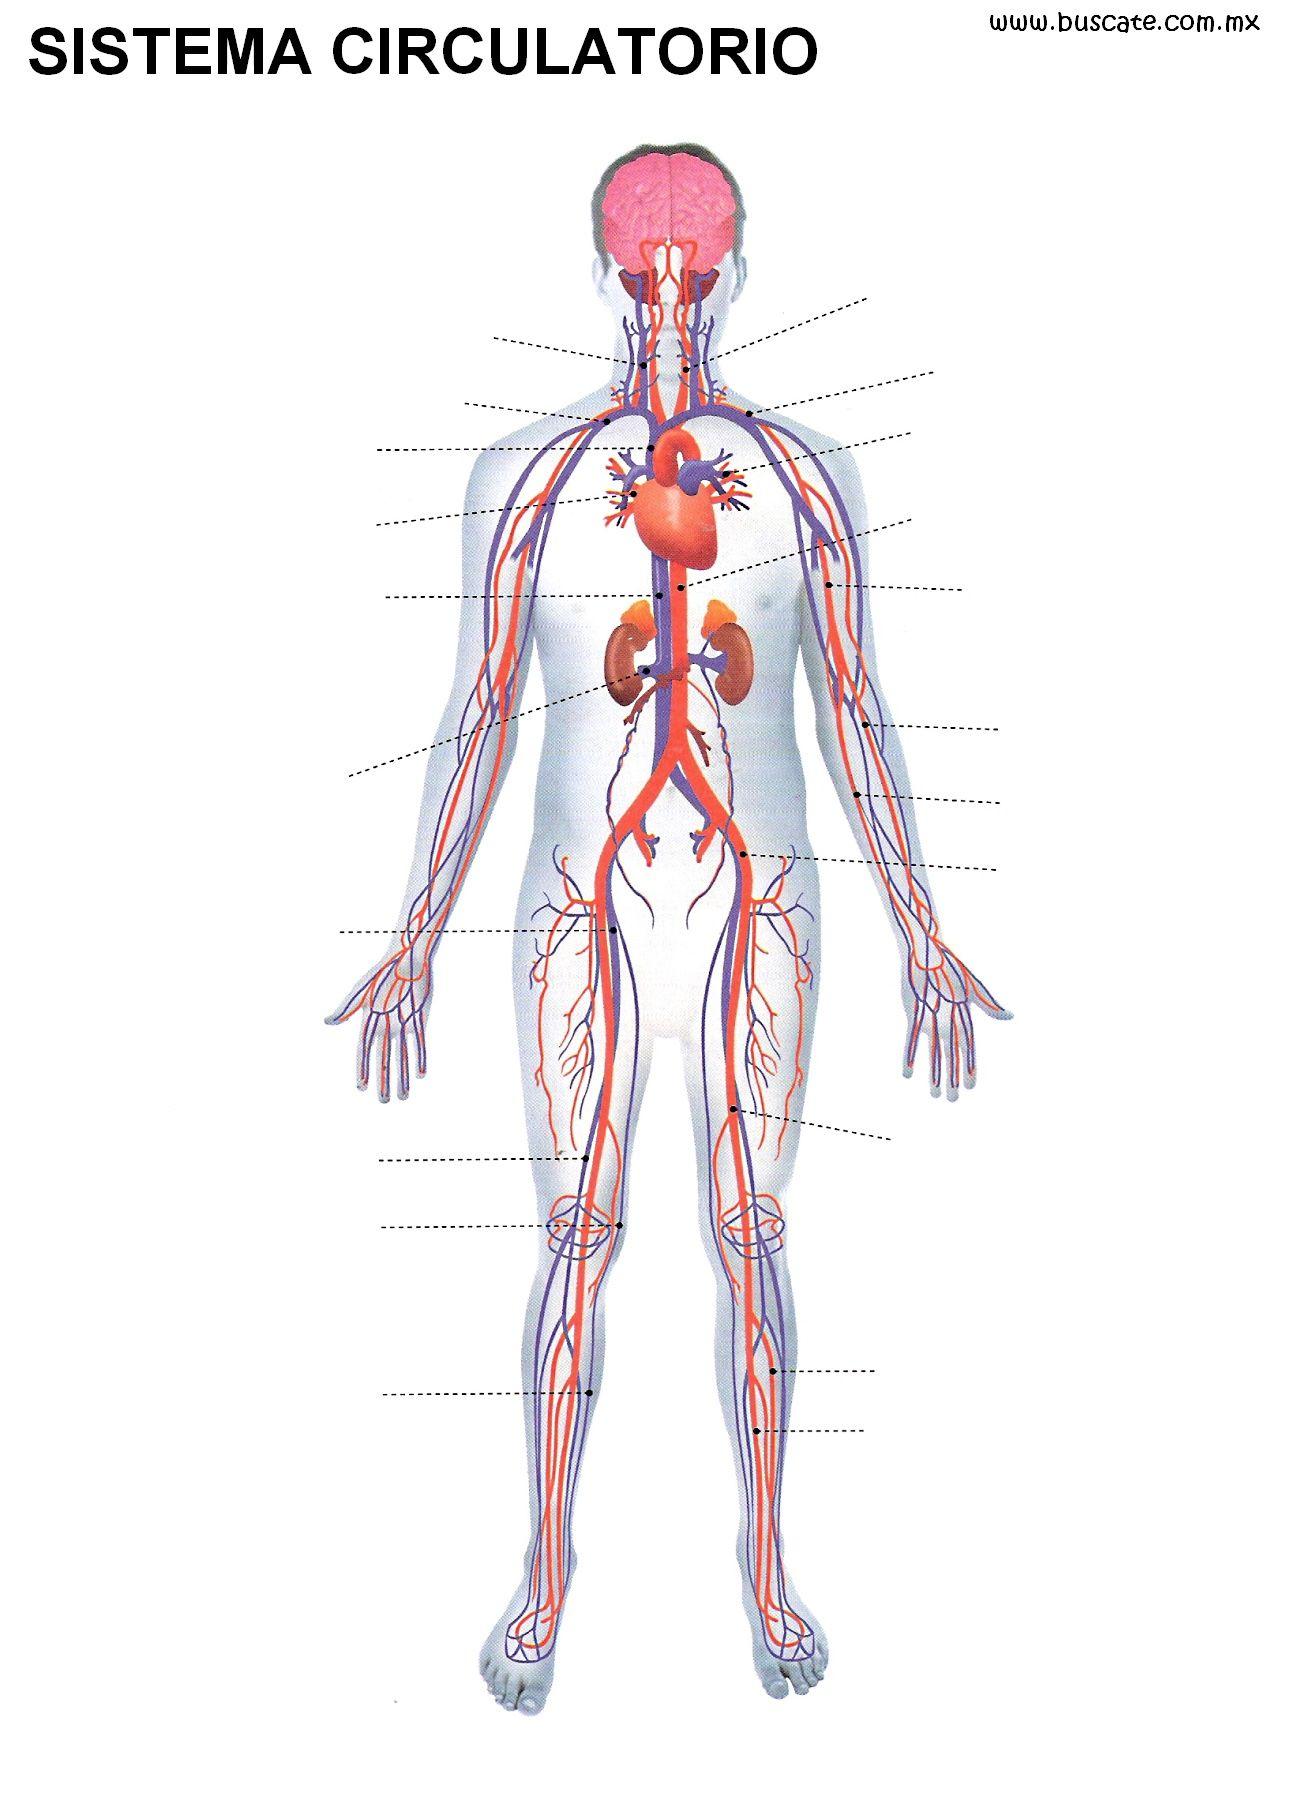 Asombroso Diagrama De Torso Humano Inspiración - Anatomía de Las ...